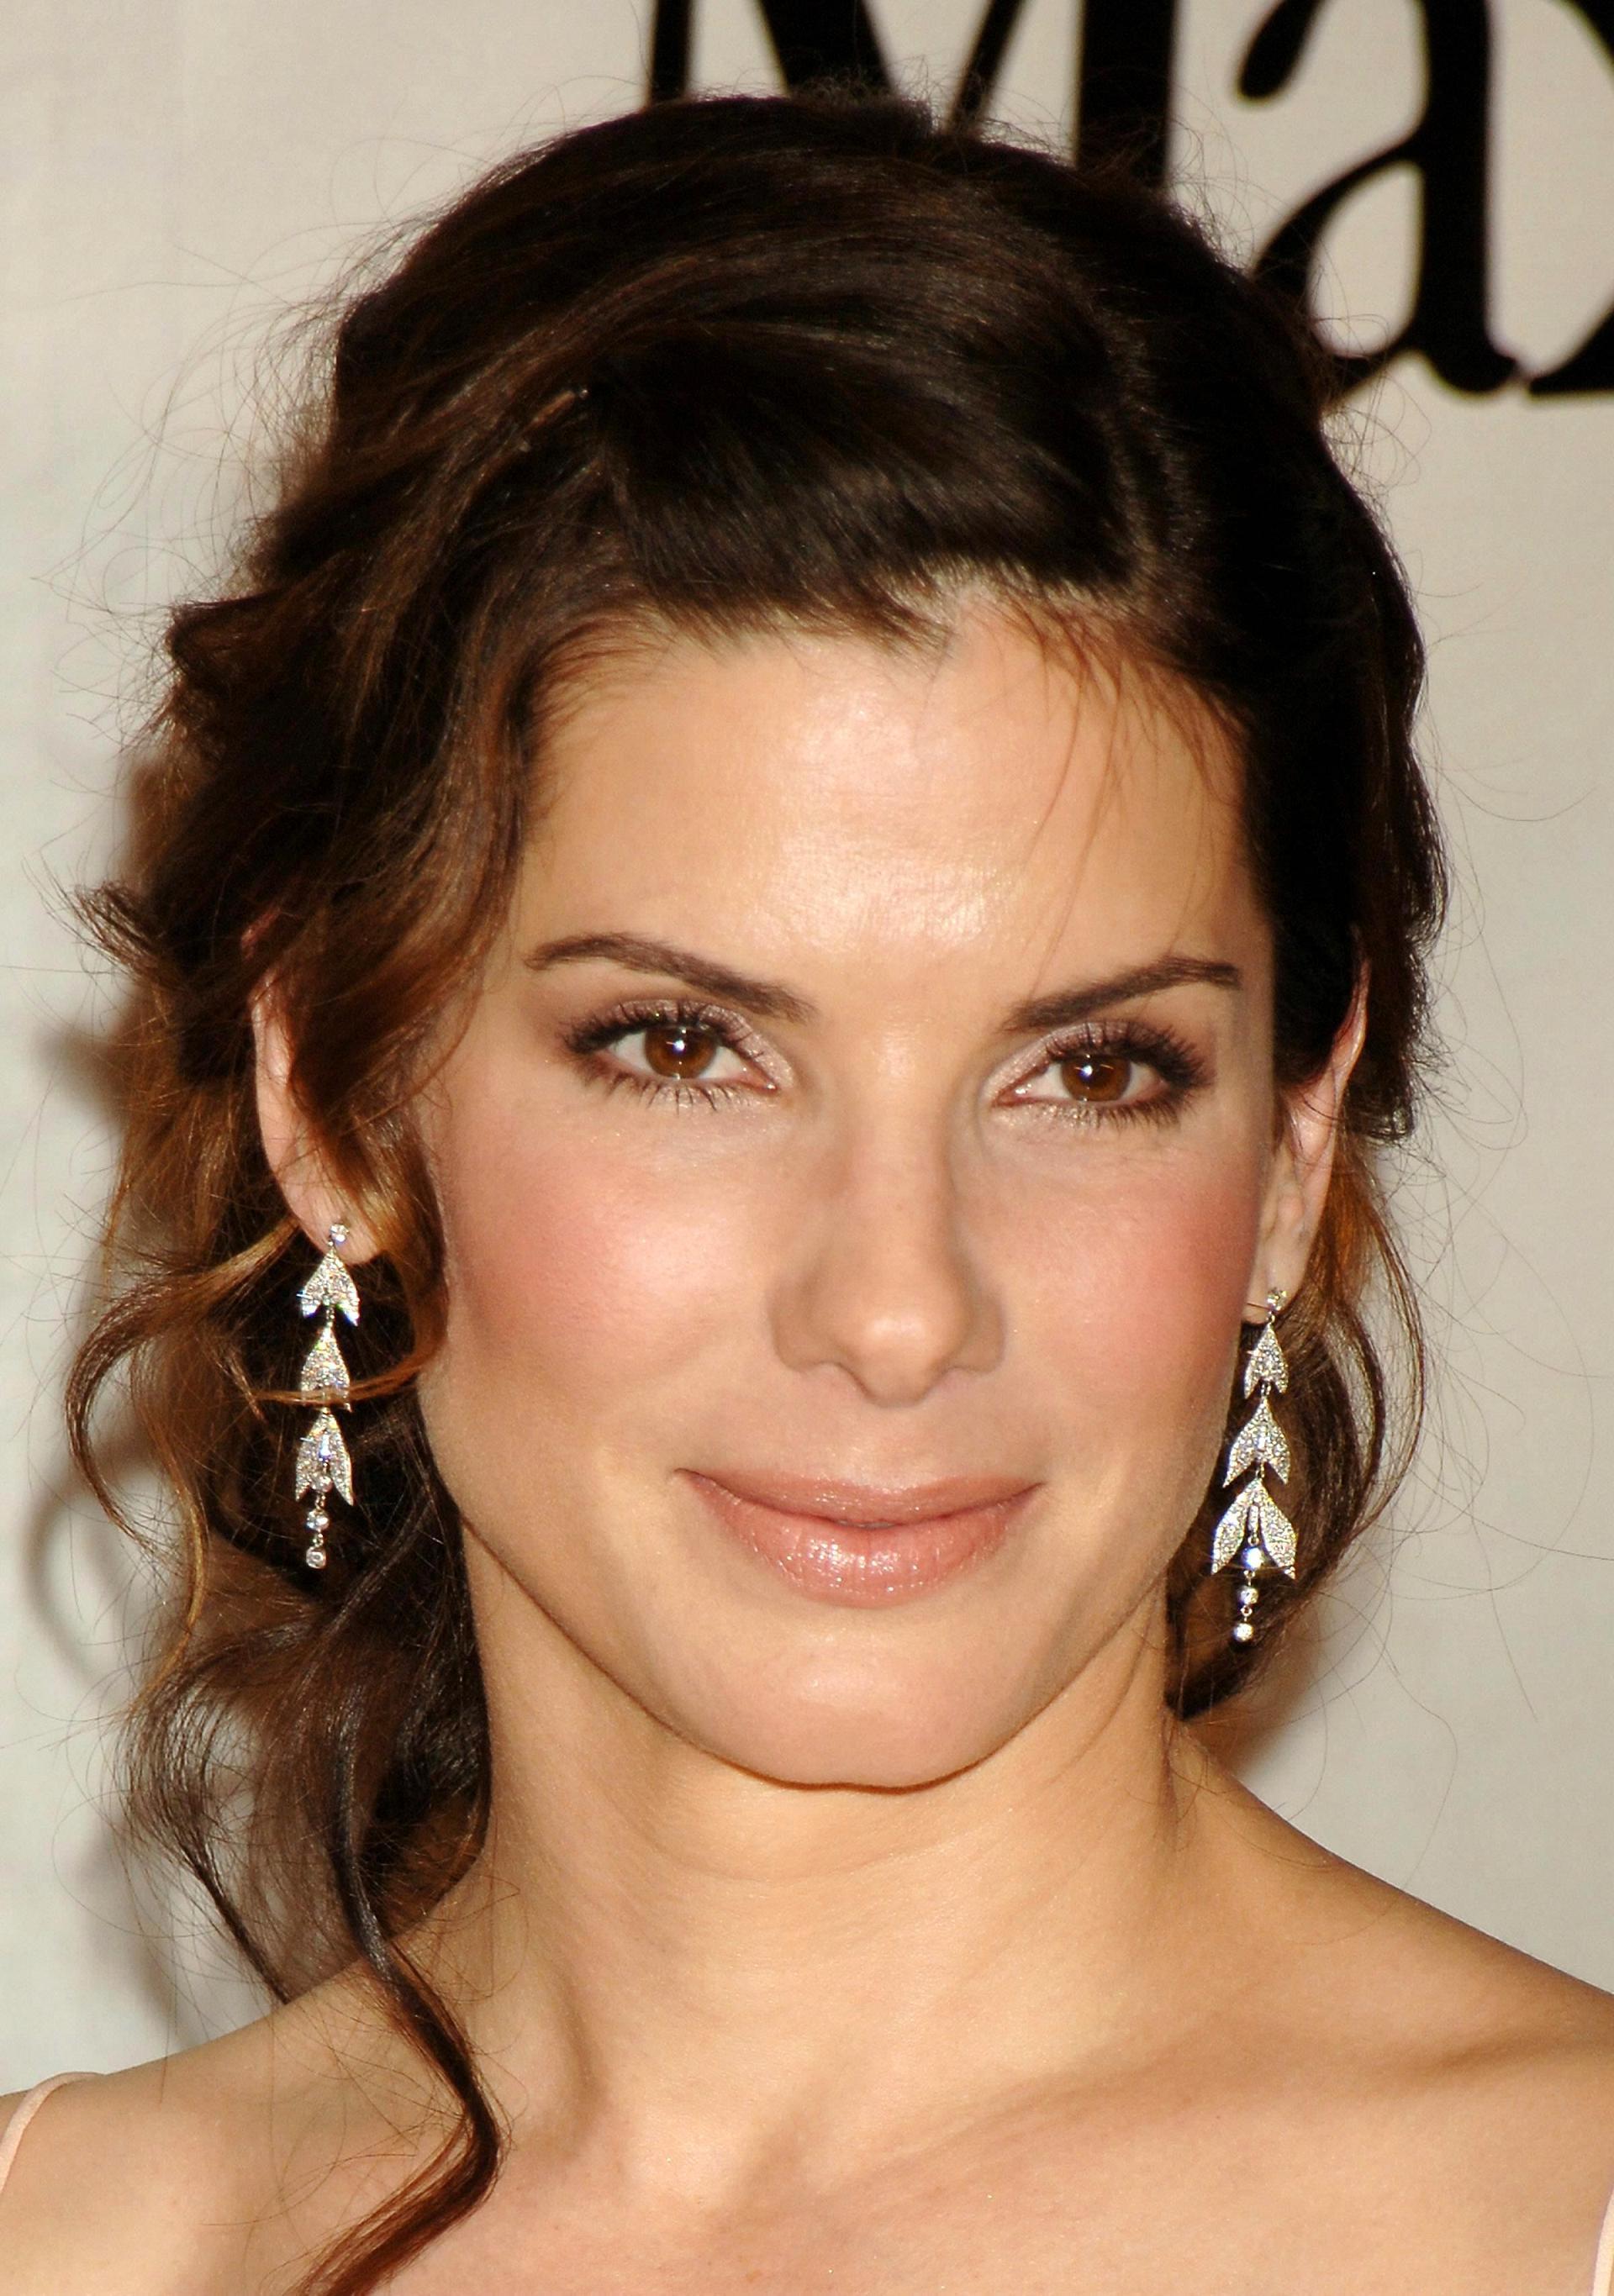 Sandra Bullock photo gallery - page #24 | Celebs-Place.com